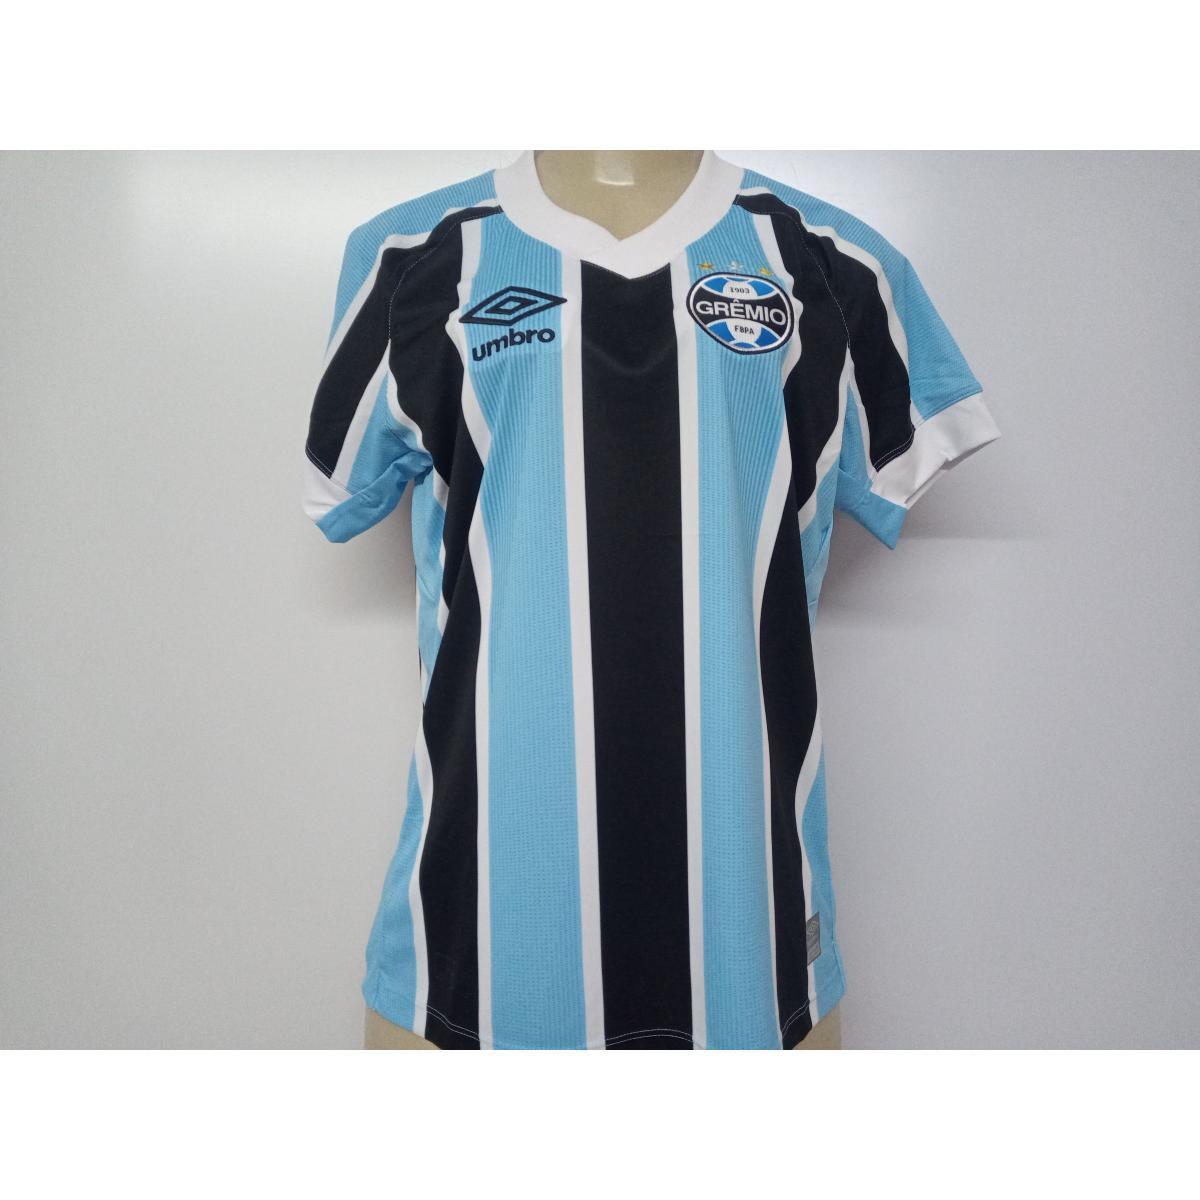 Camiseta Feminina Grêmio U32g026.312 Fem 0f 1 2021 Celeste/preto/branco